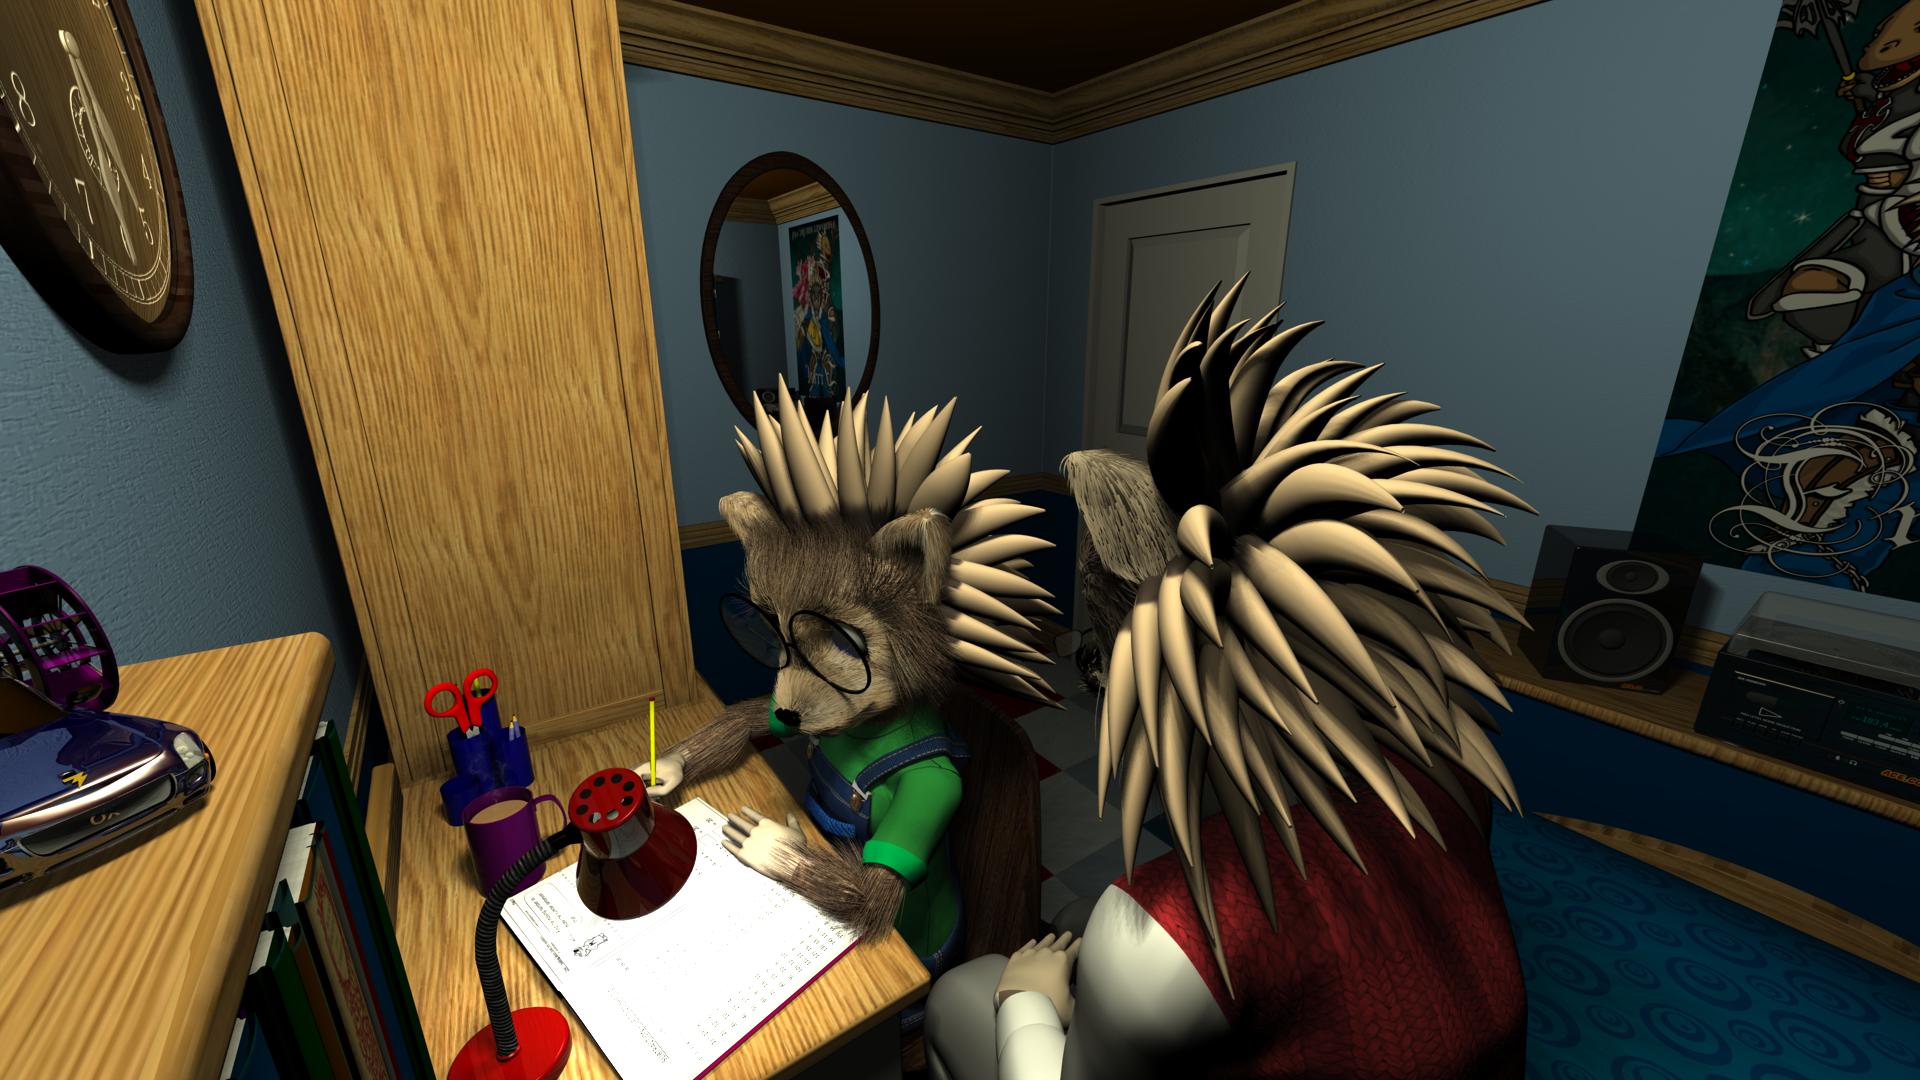 Bernie doing homework0.png